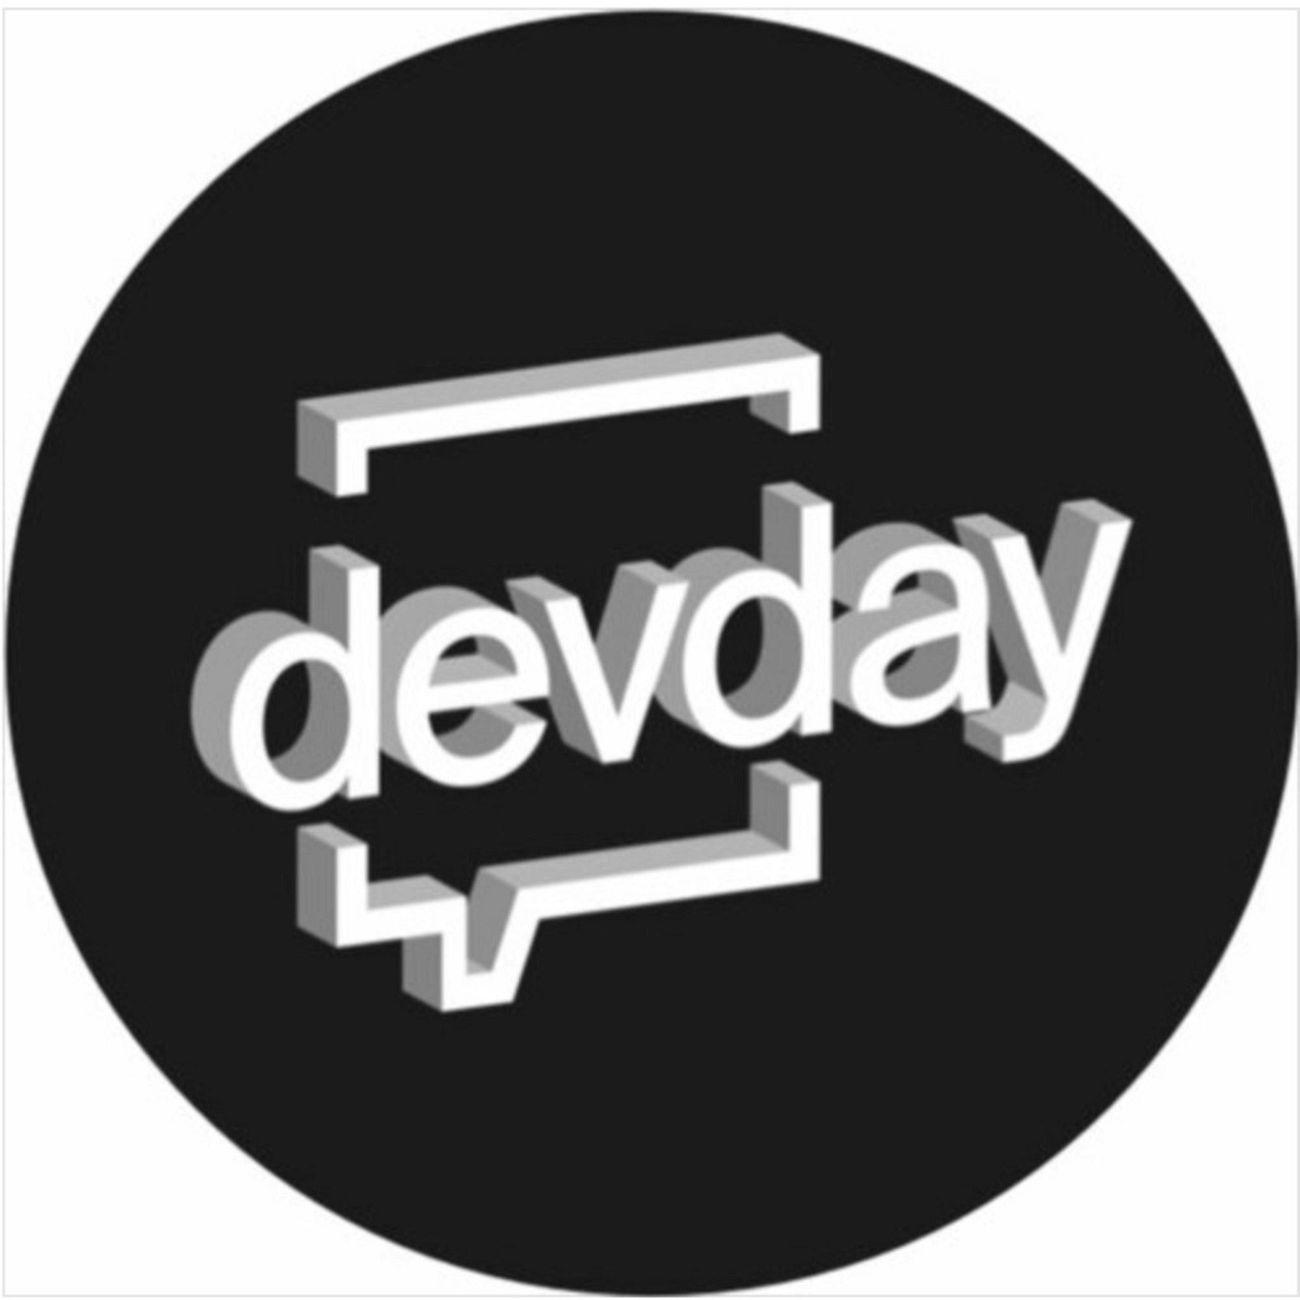 DevDay Podcast